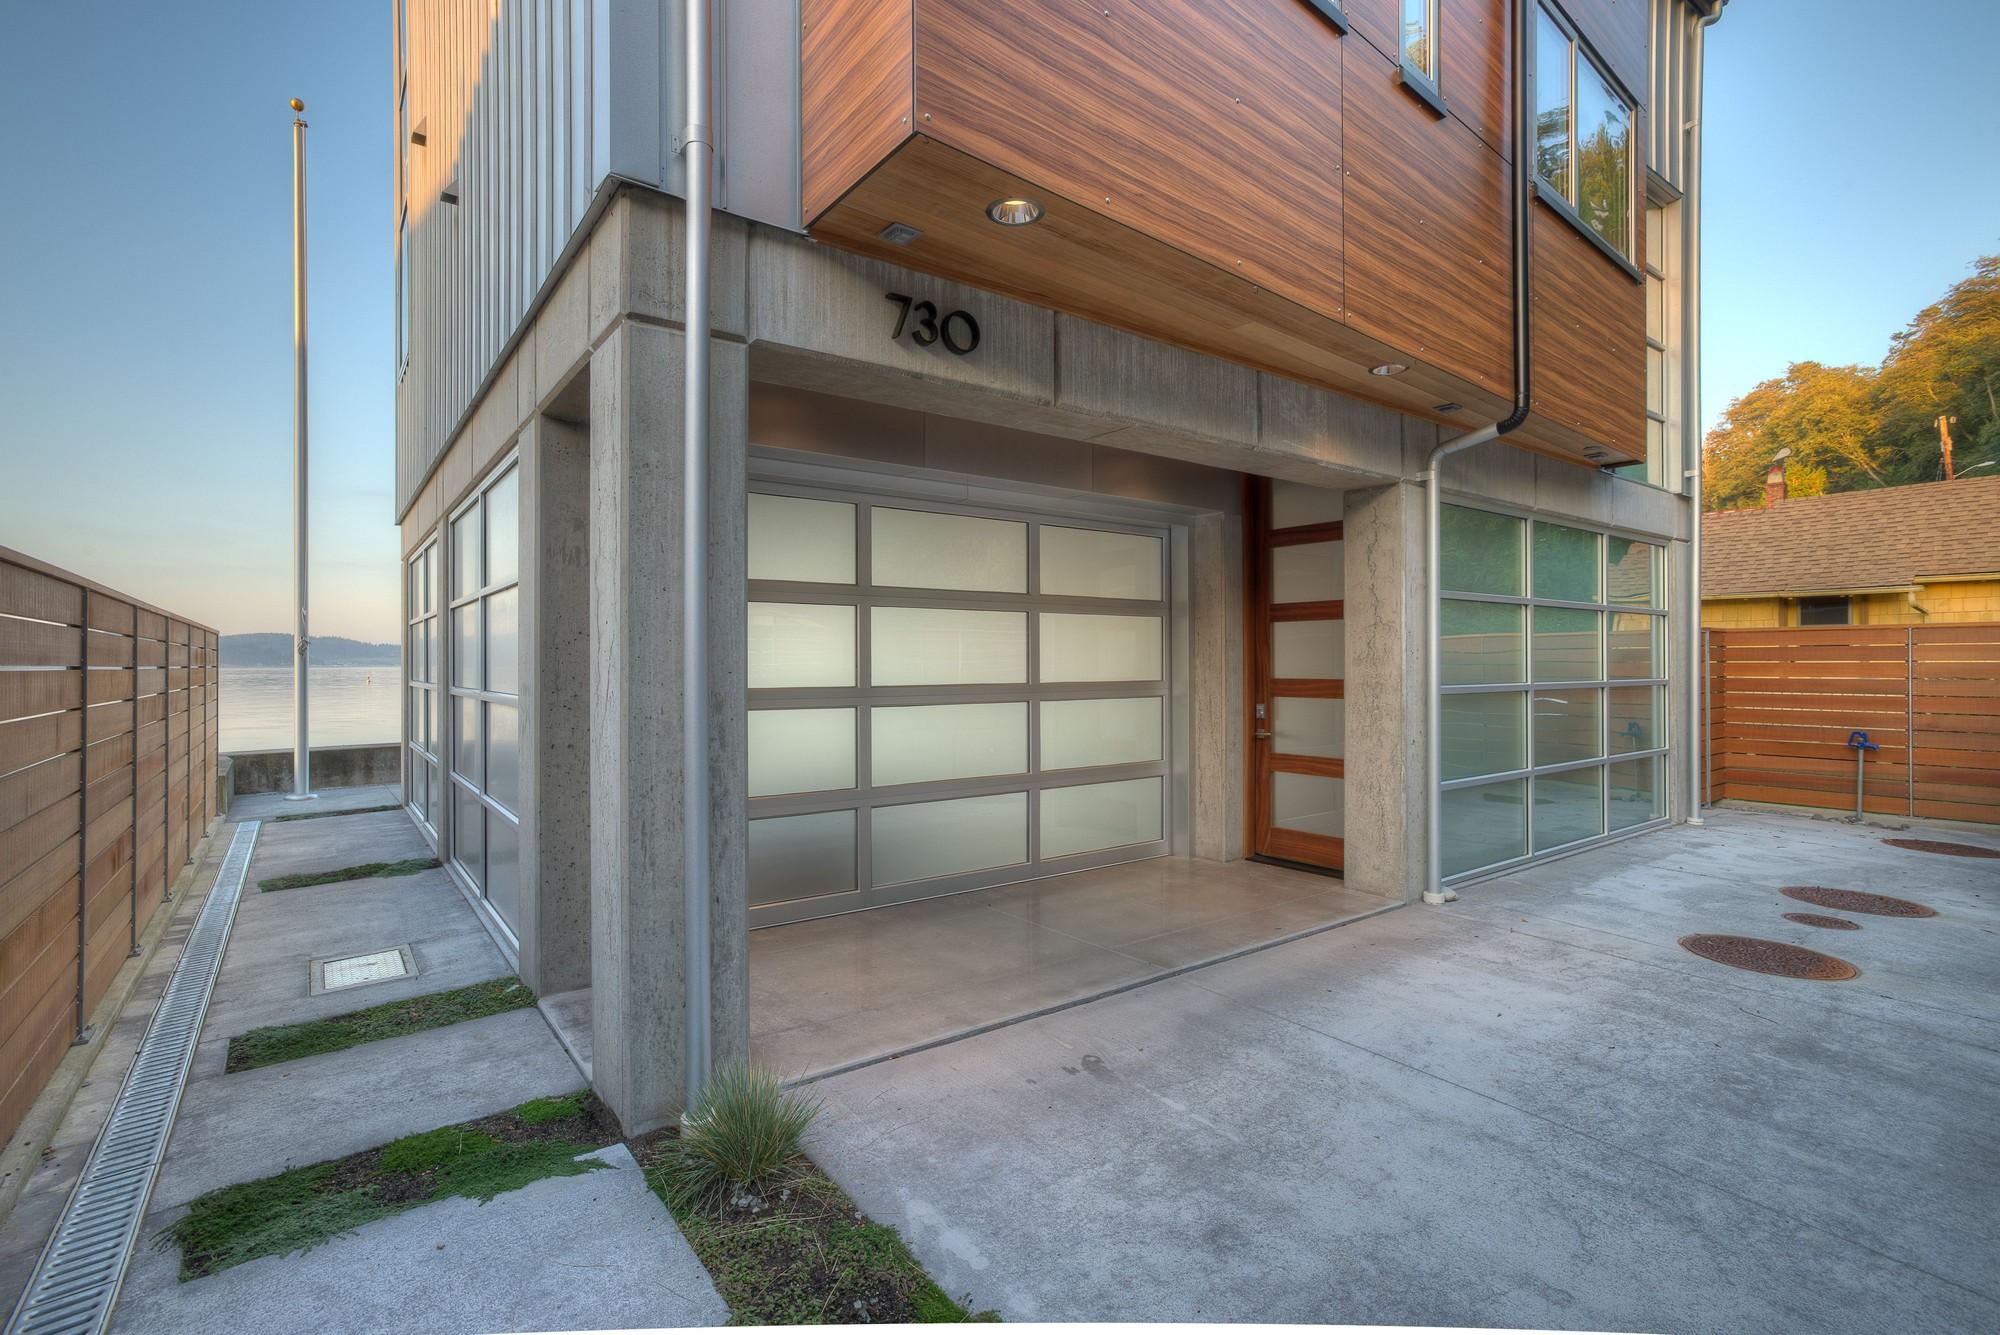 Gallery of tsunami house designs northwest architect 12 for Northwest architects